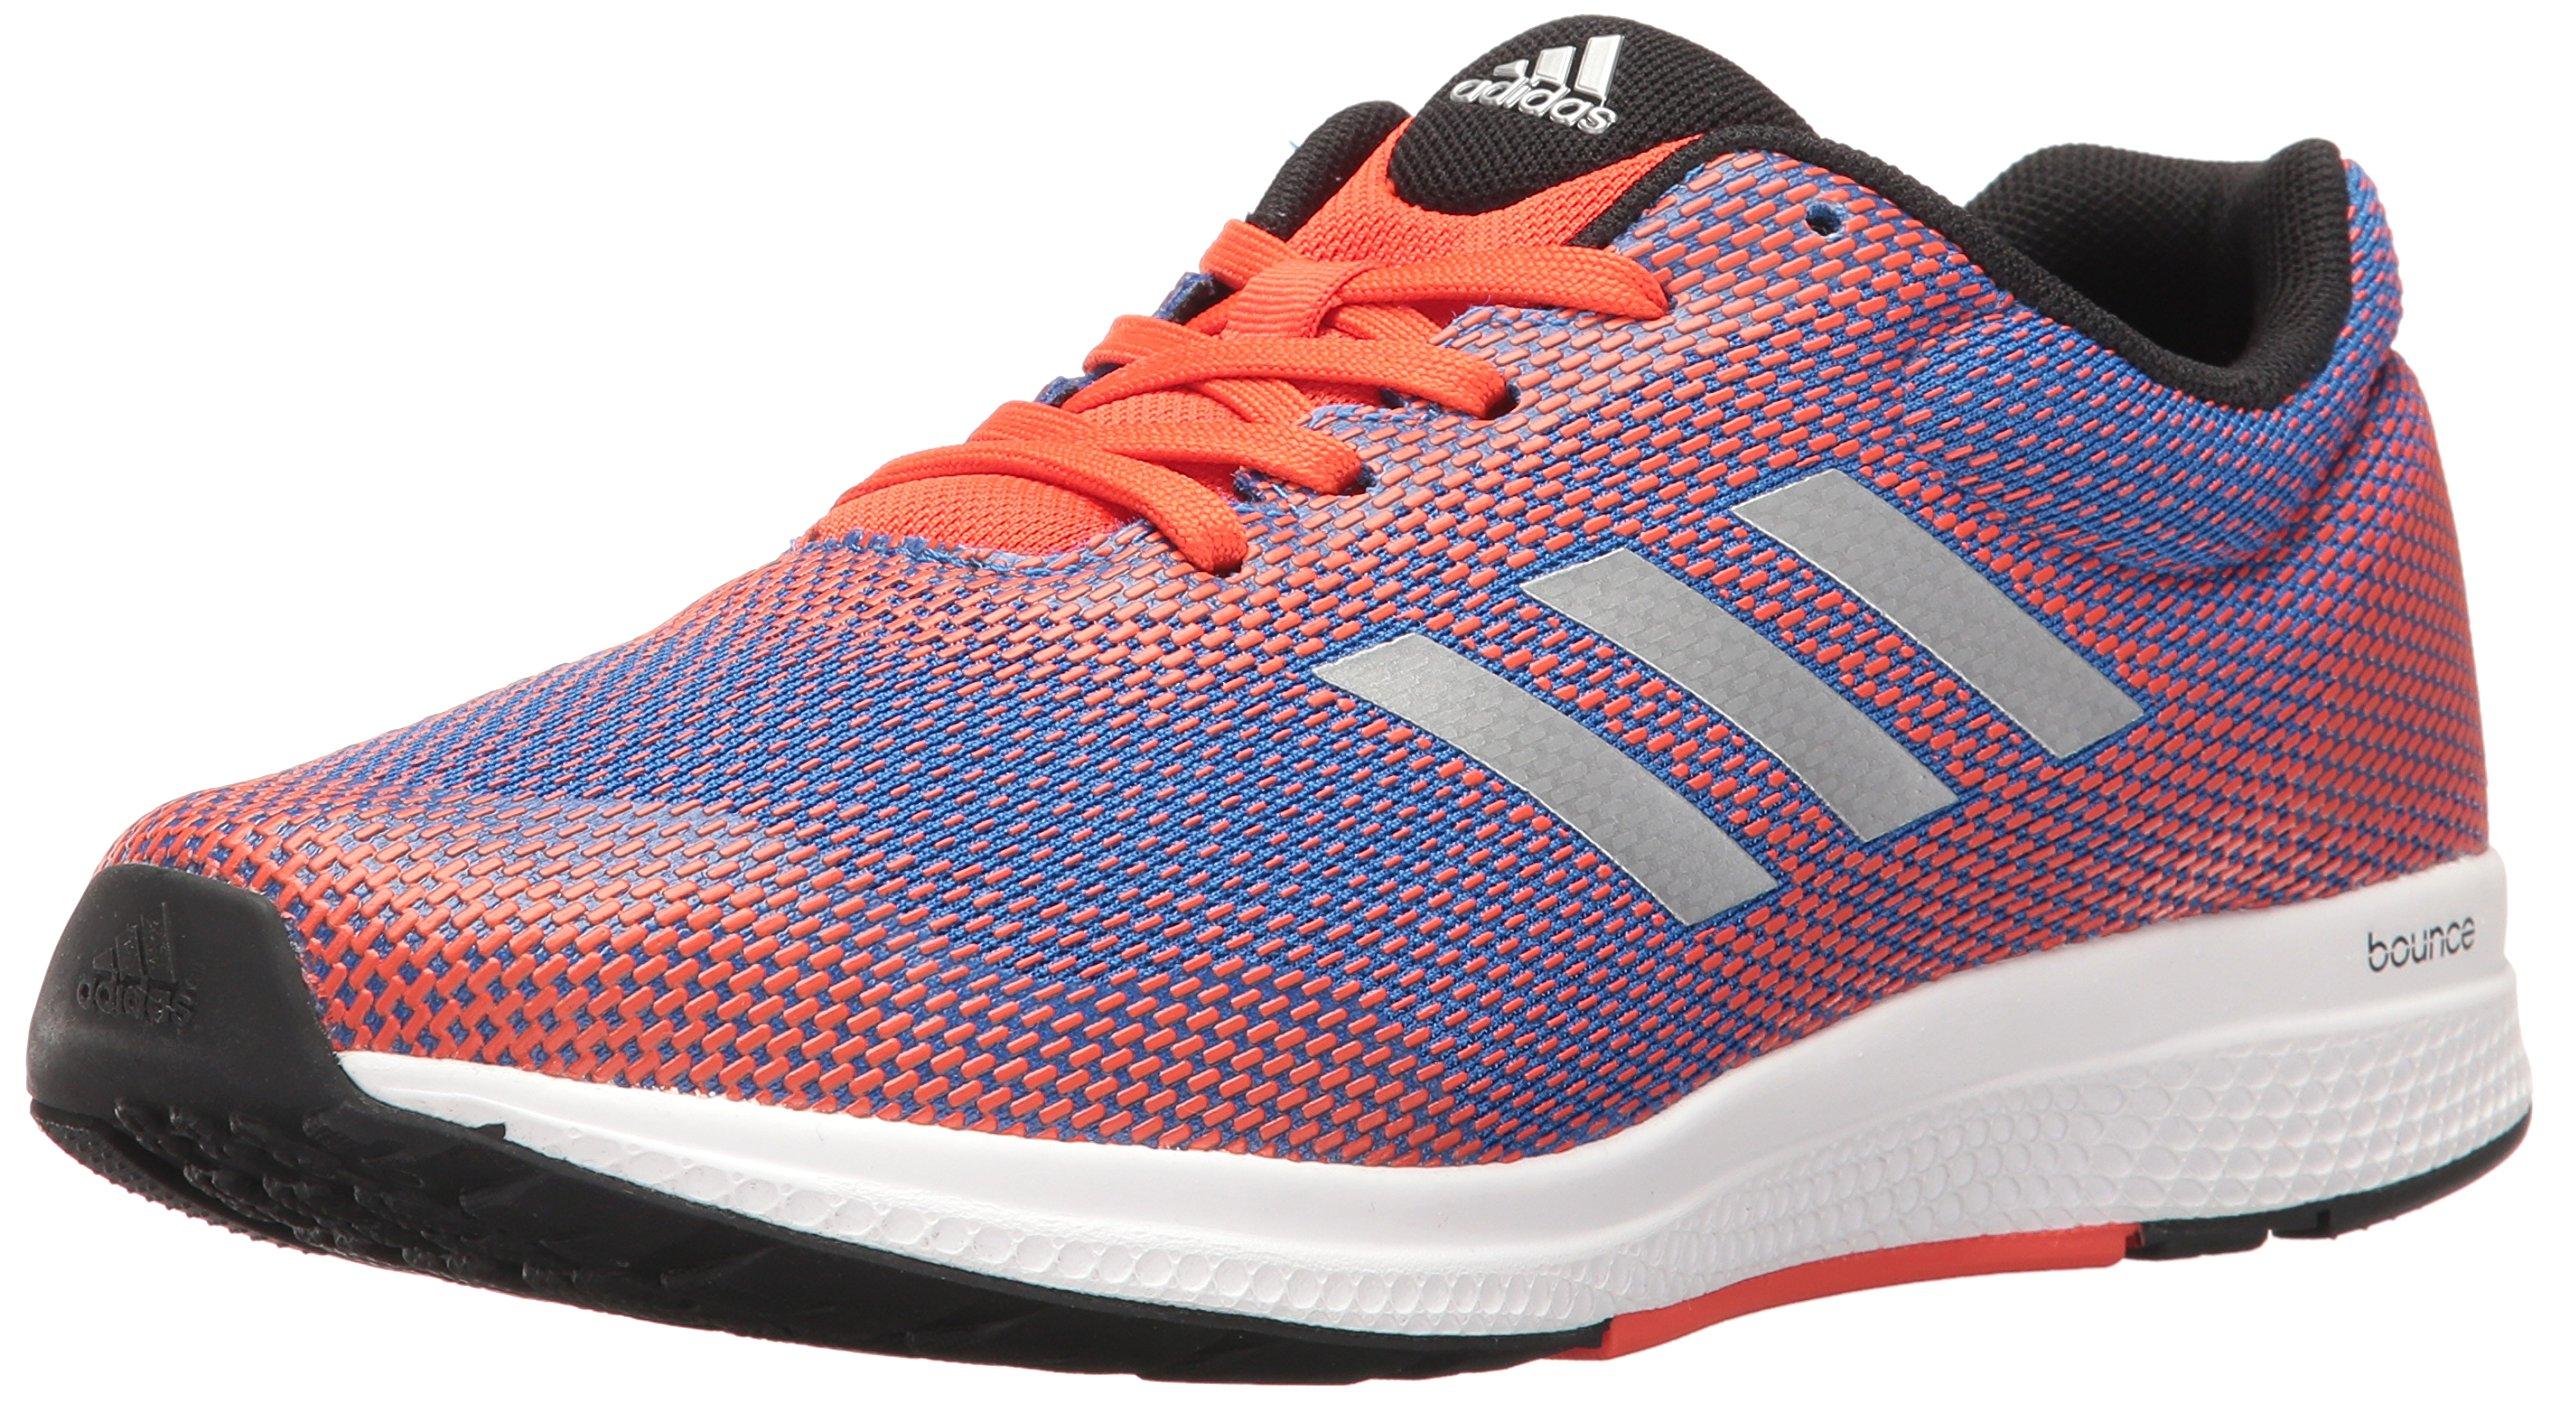 74ff9865e5c33 Galleon - Adidas Performance Men s Mana Bounce 2 M Aramis Running Shoe